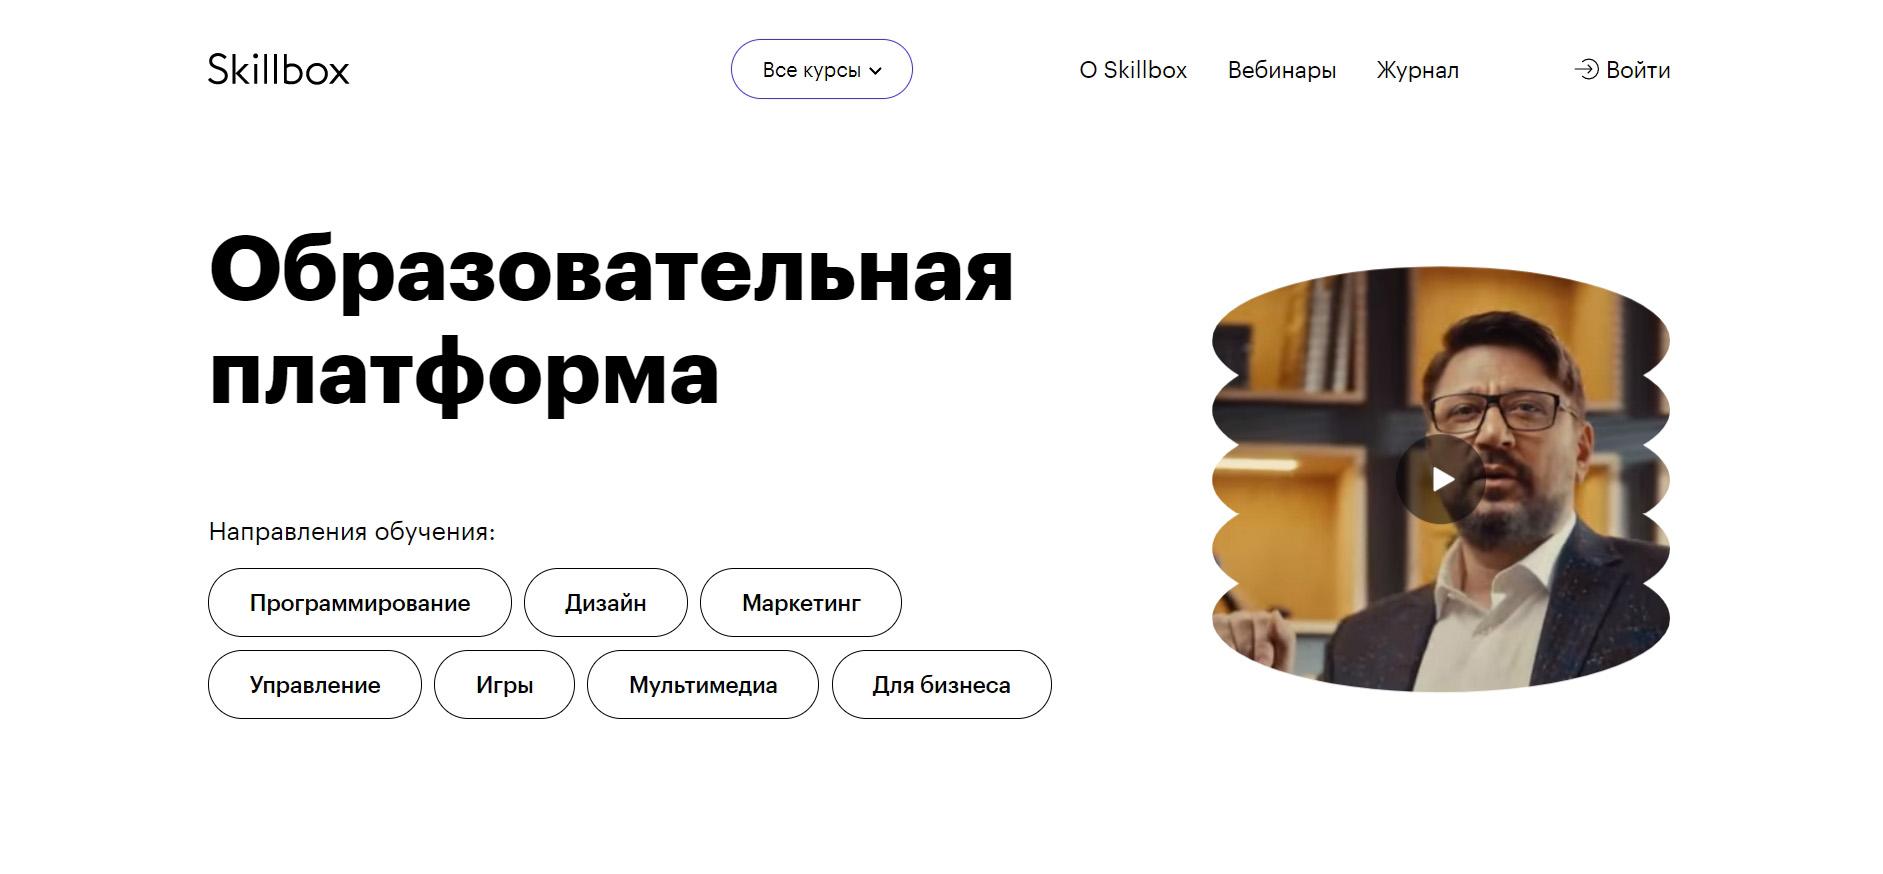 Skillbox — курсы по дизайну